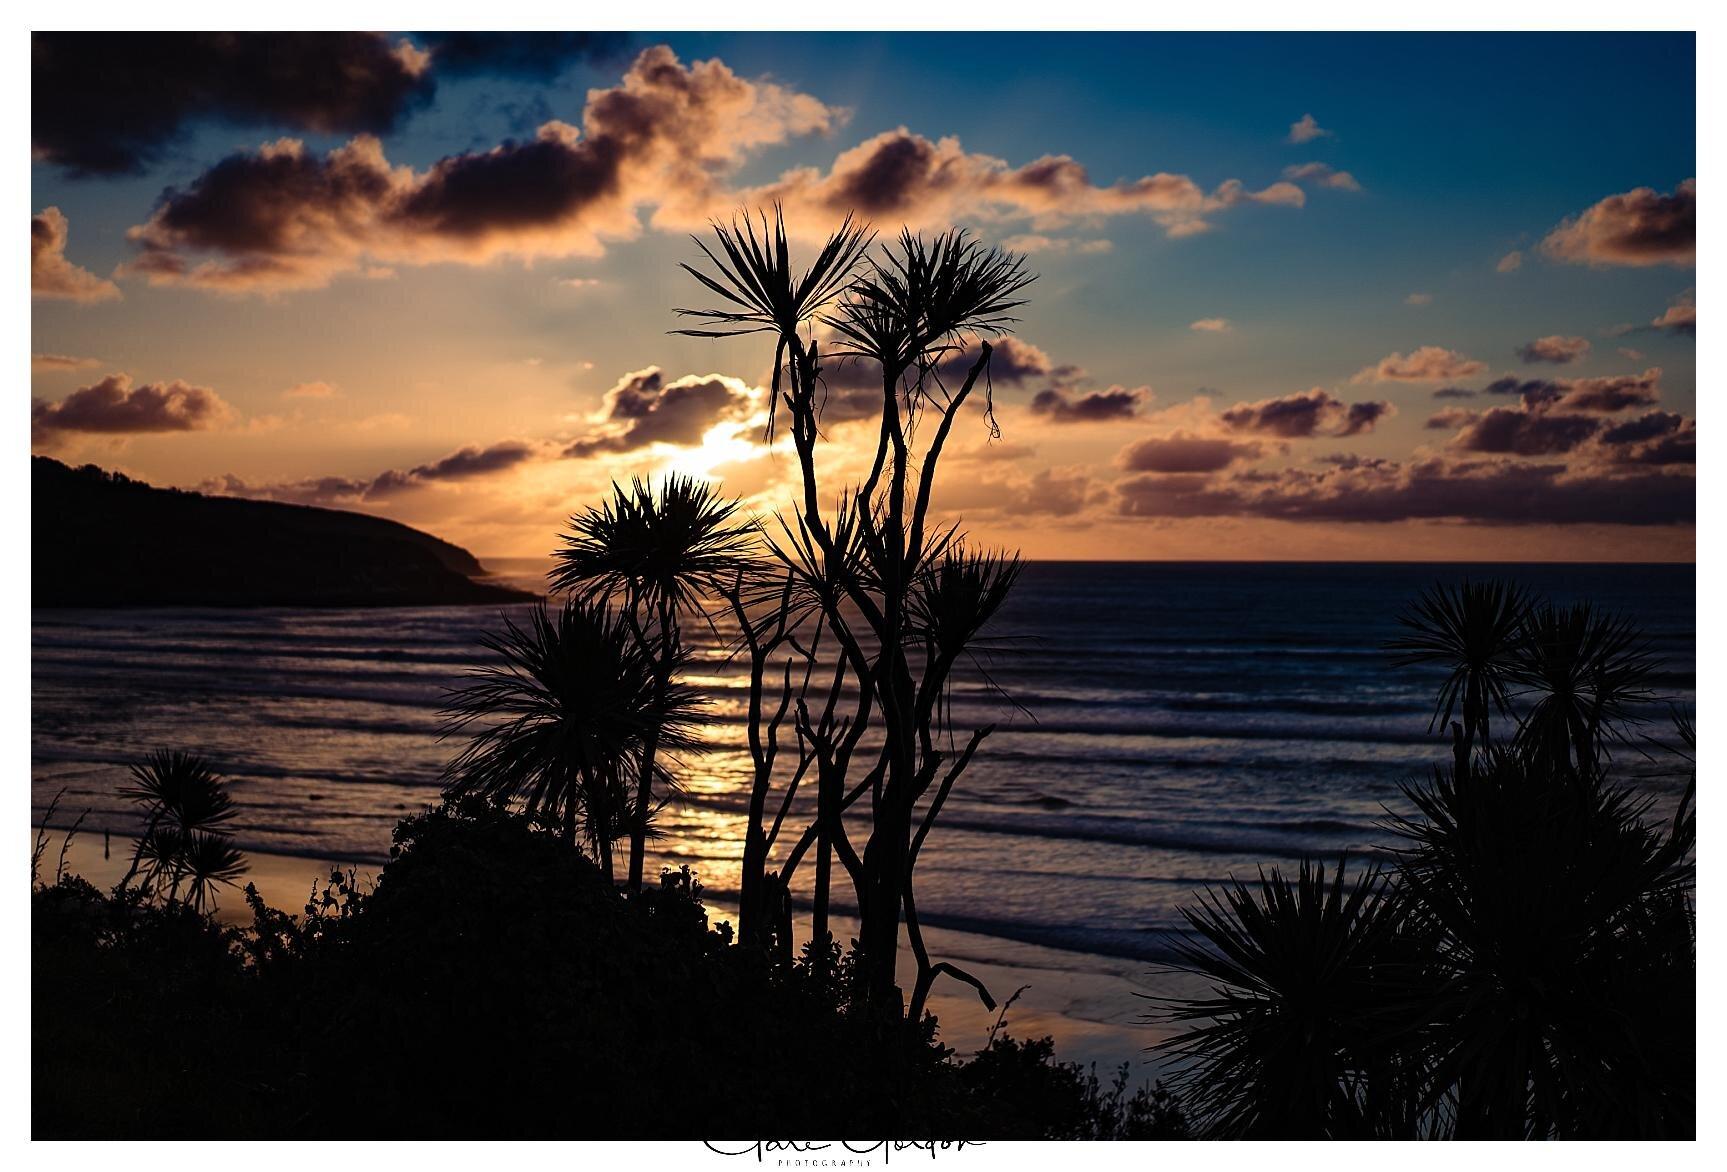 Raglan-beach-NZ-couples-engagement-photos-West-coast-Newzealand (1).jpg